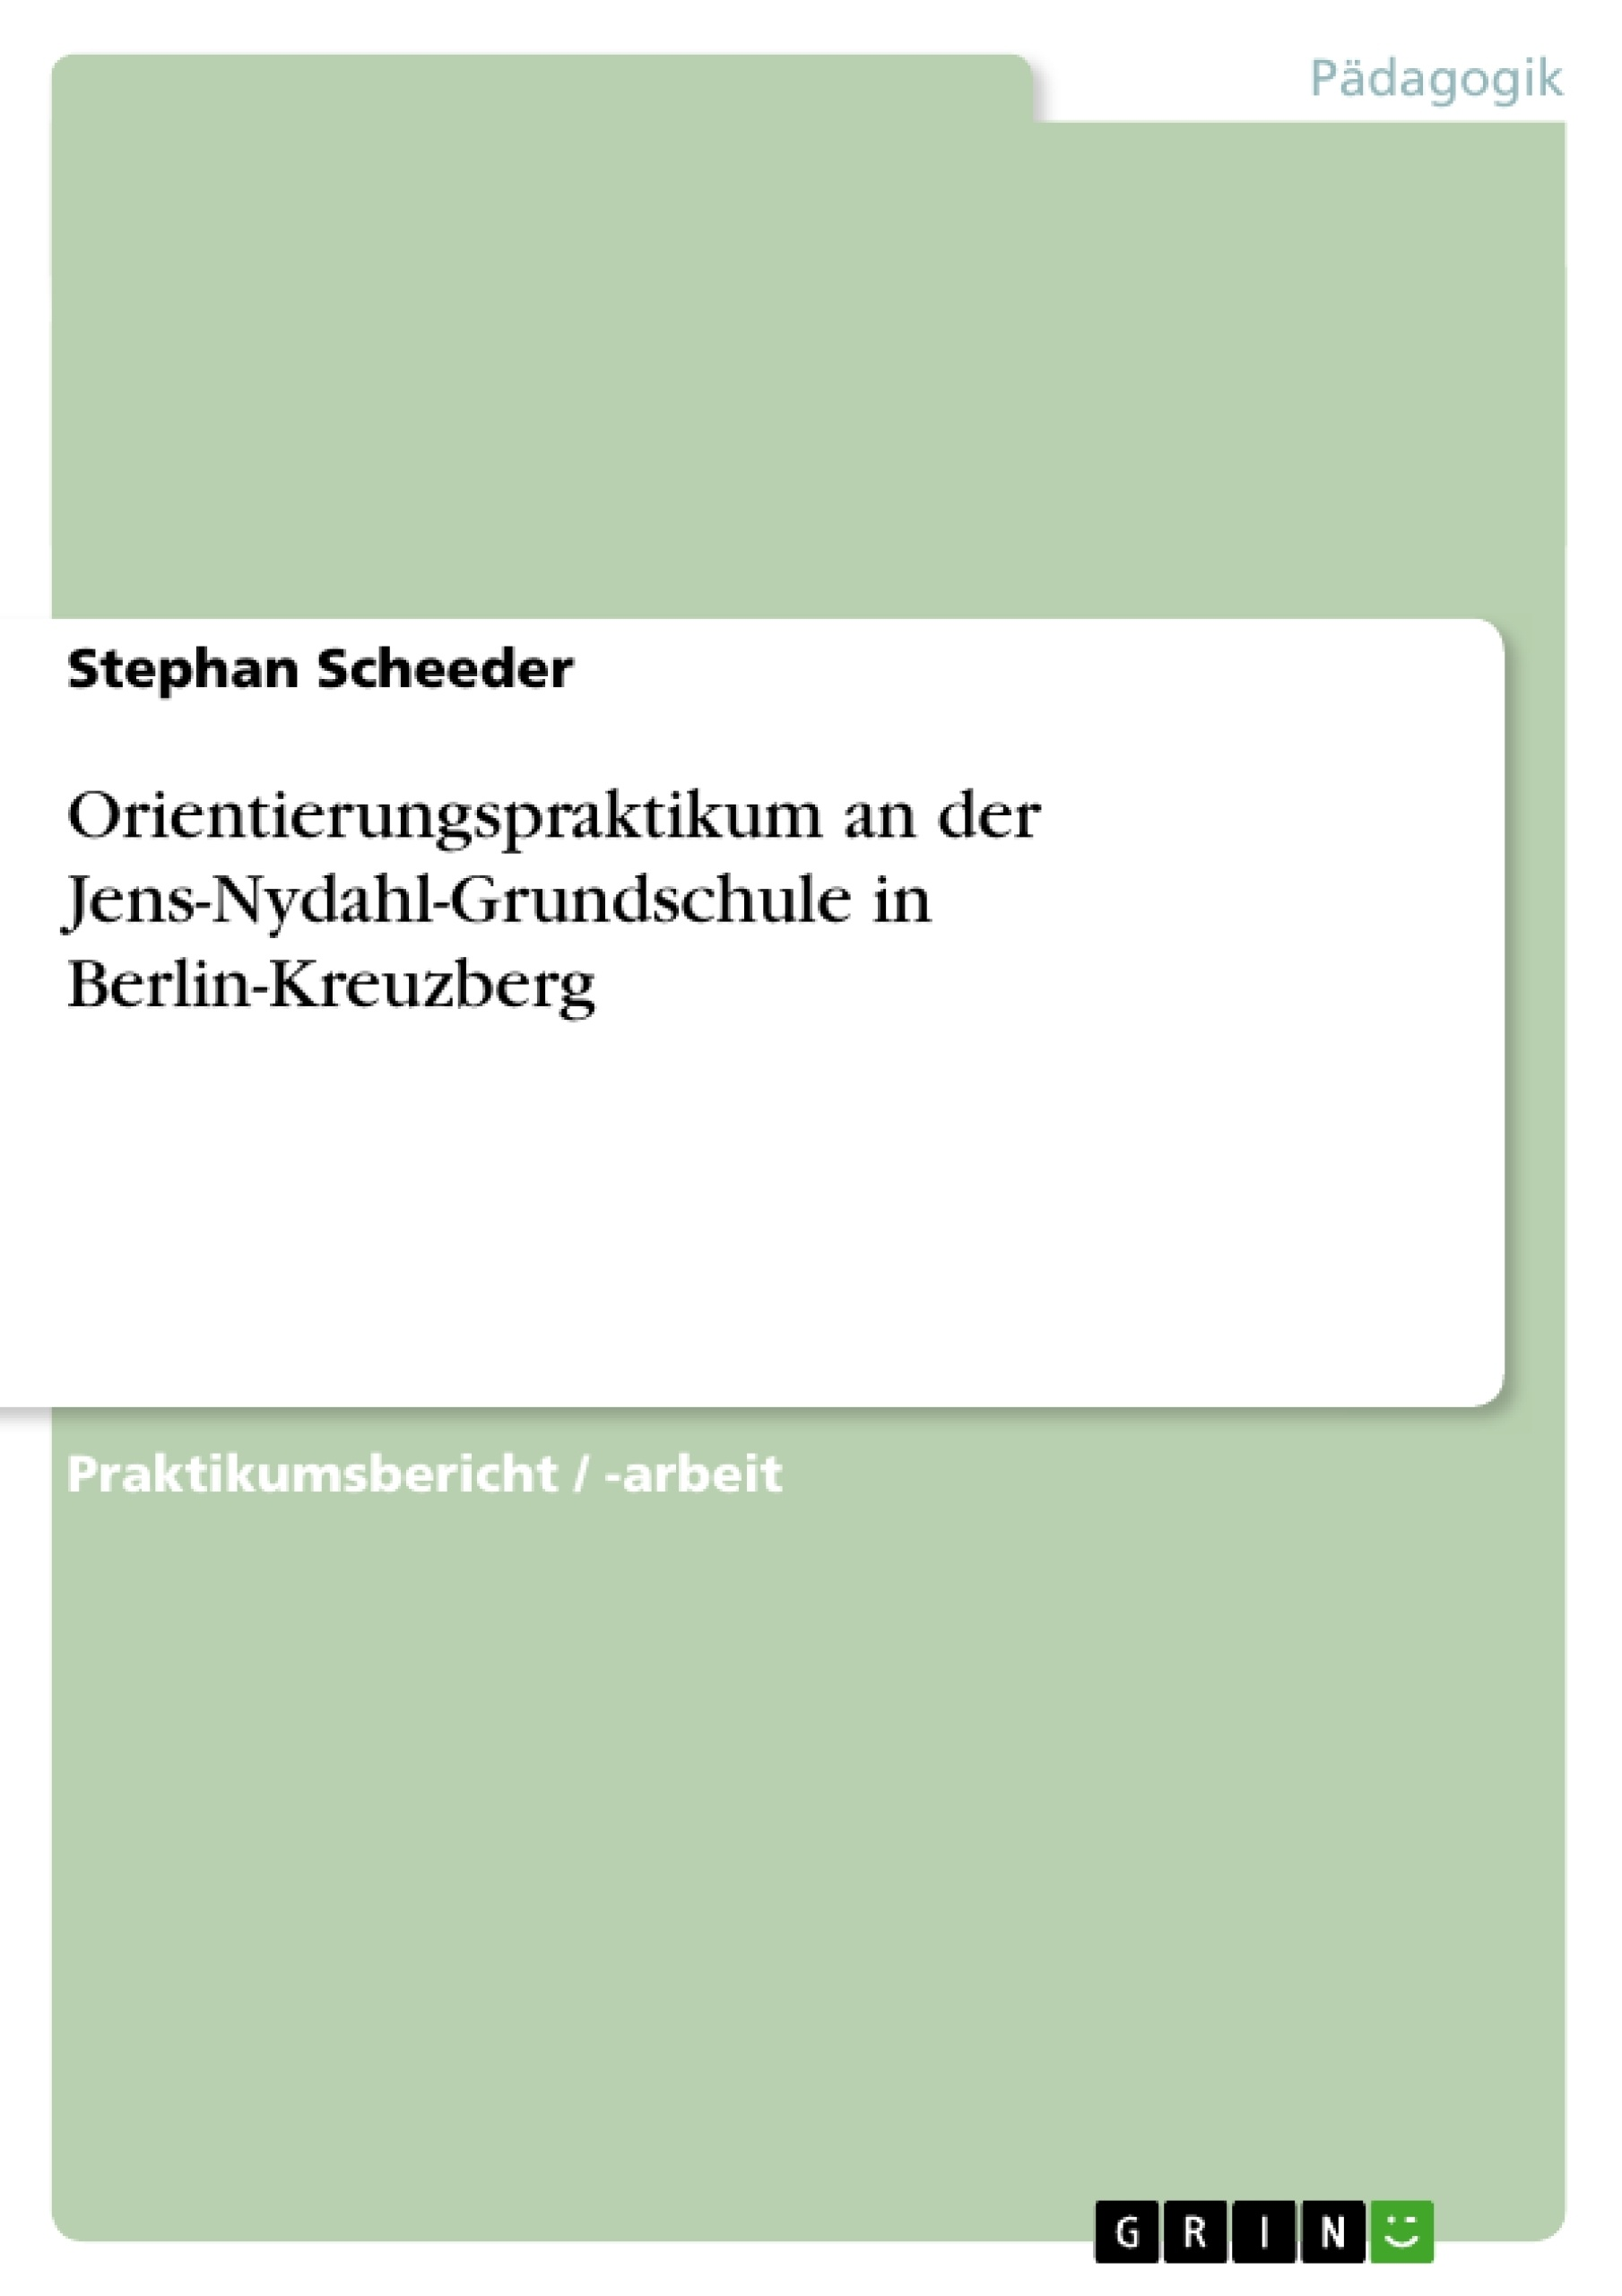 Titel: Orientierungspraktikum an der Jens-Nydahl-Grundschule in Berlin-Kreuzberg